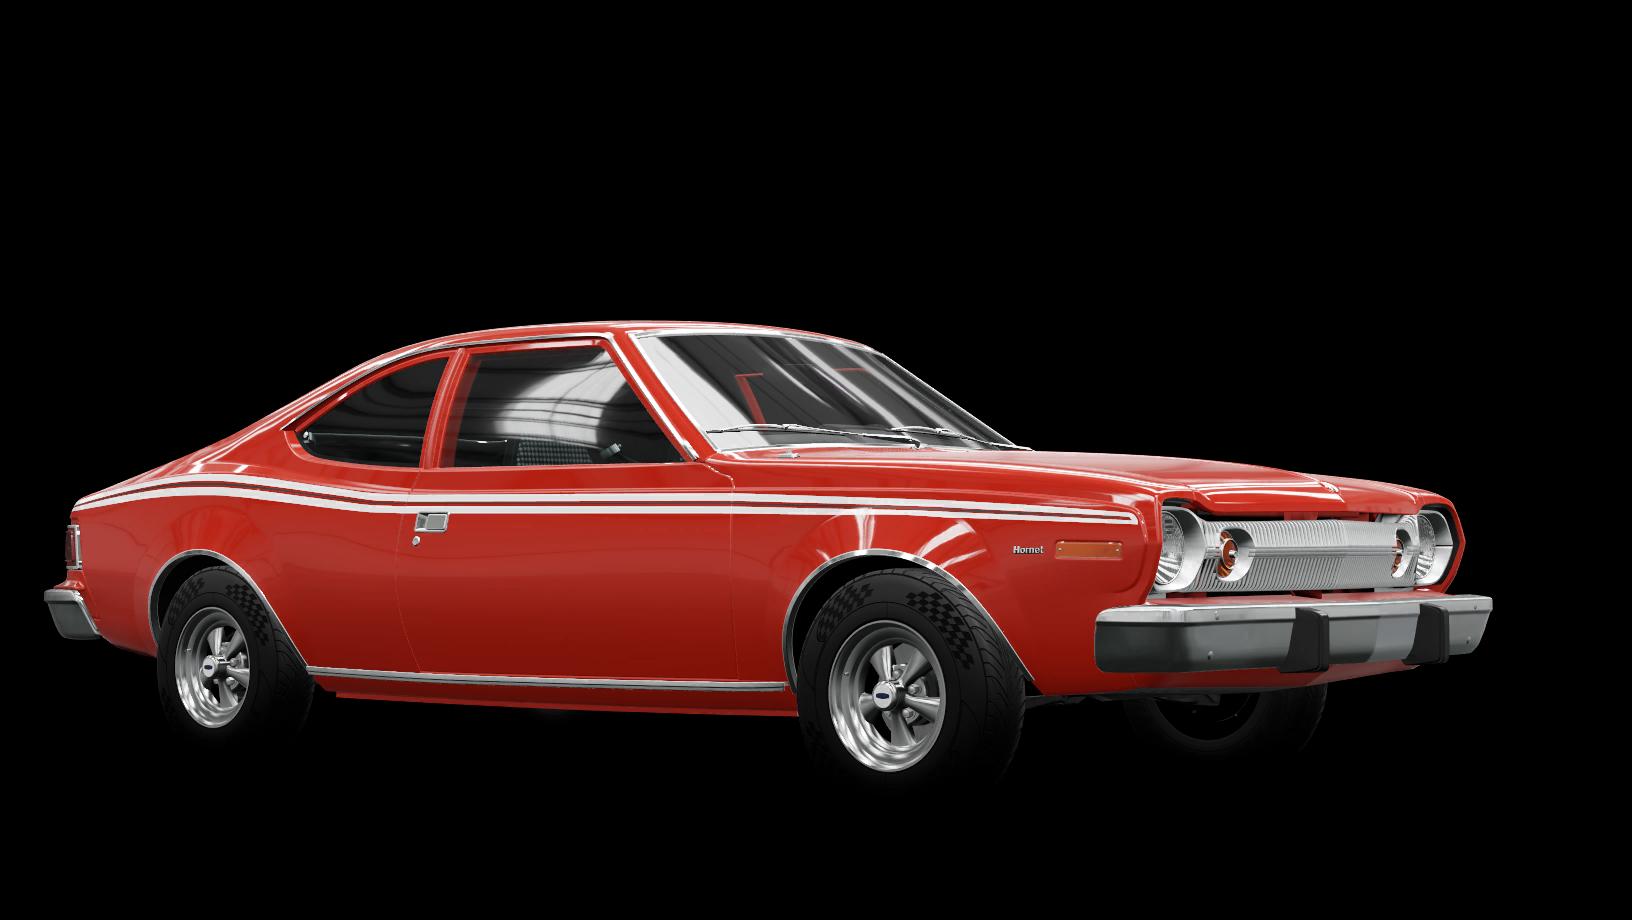 James Bond Edition AMC Hornet X Hatchback